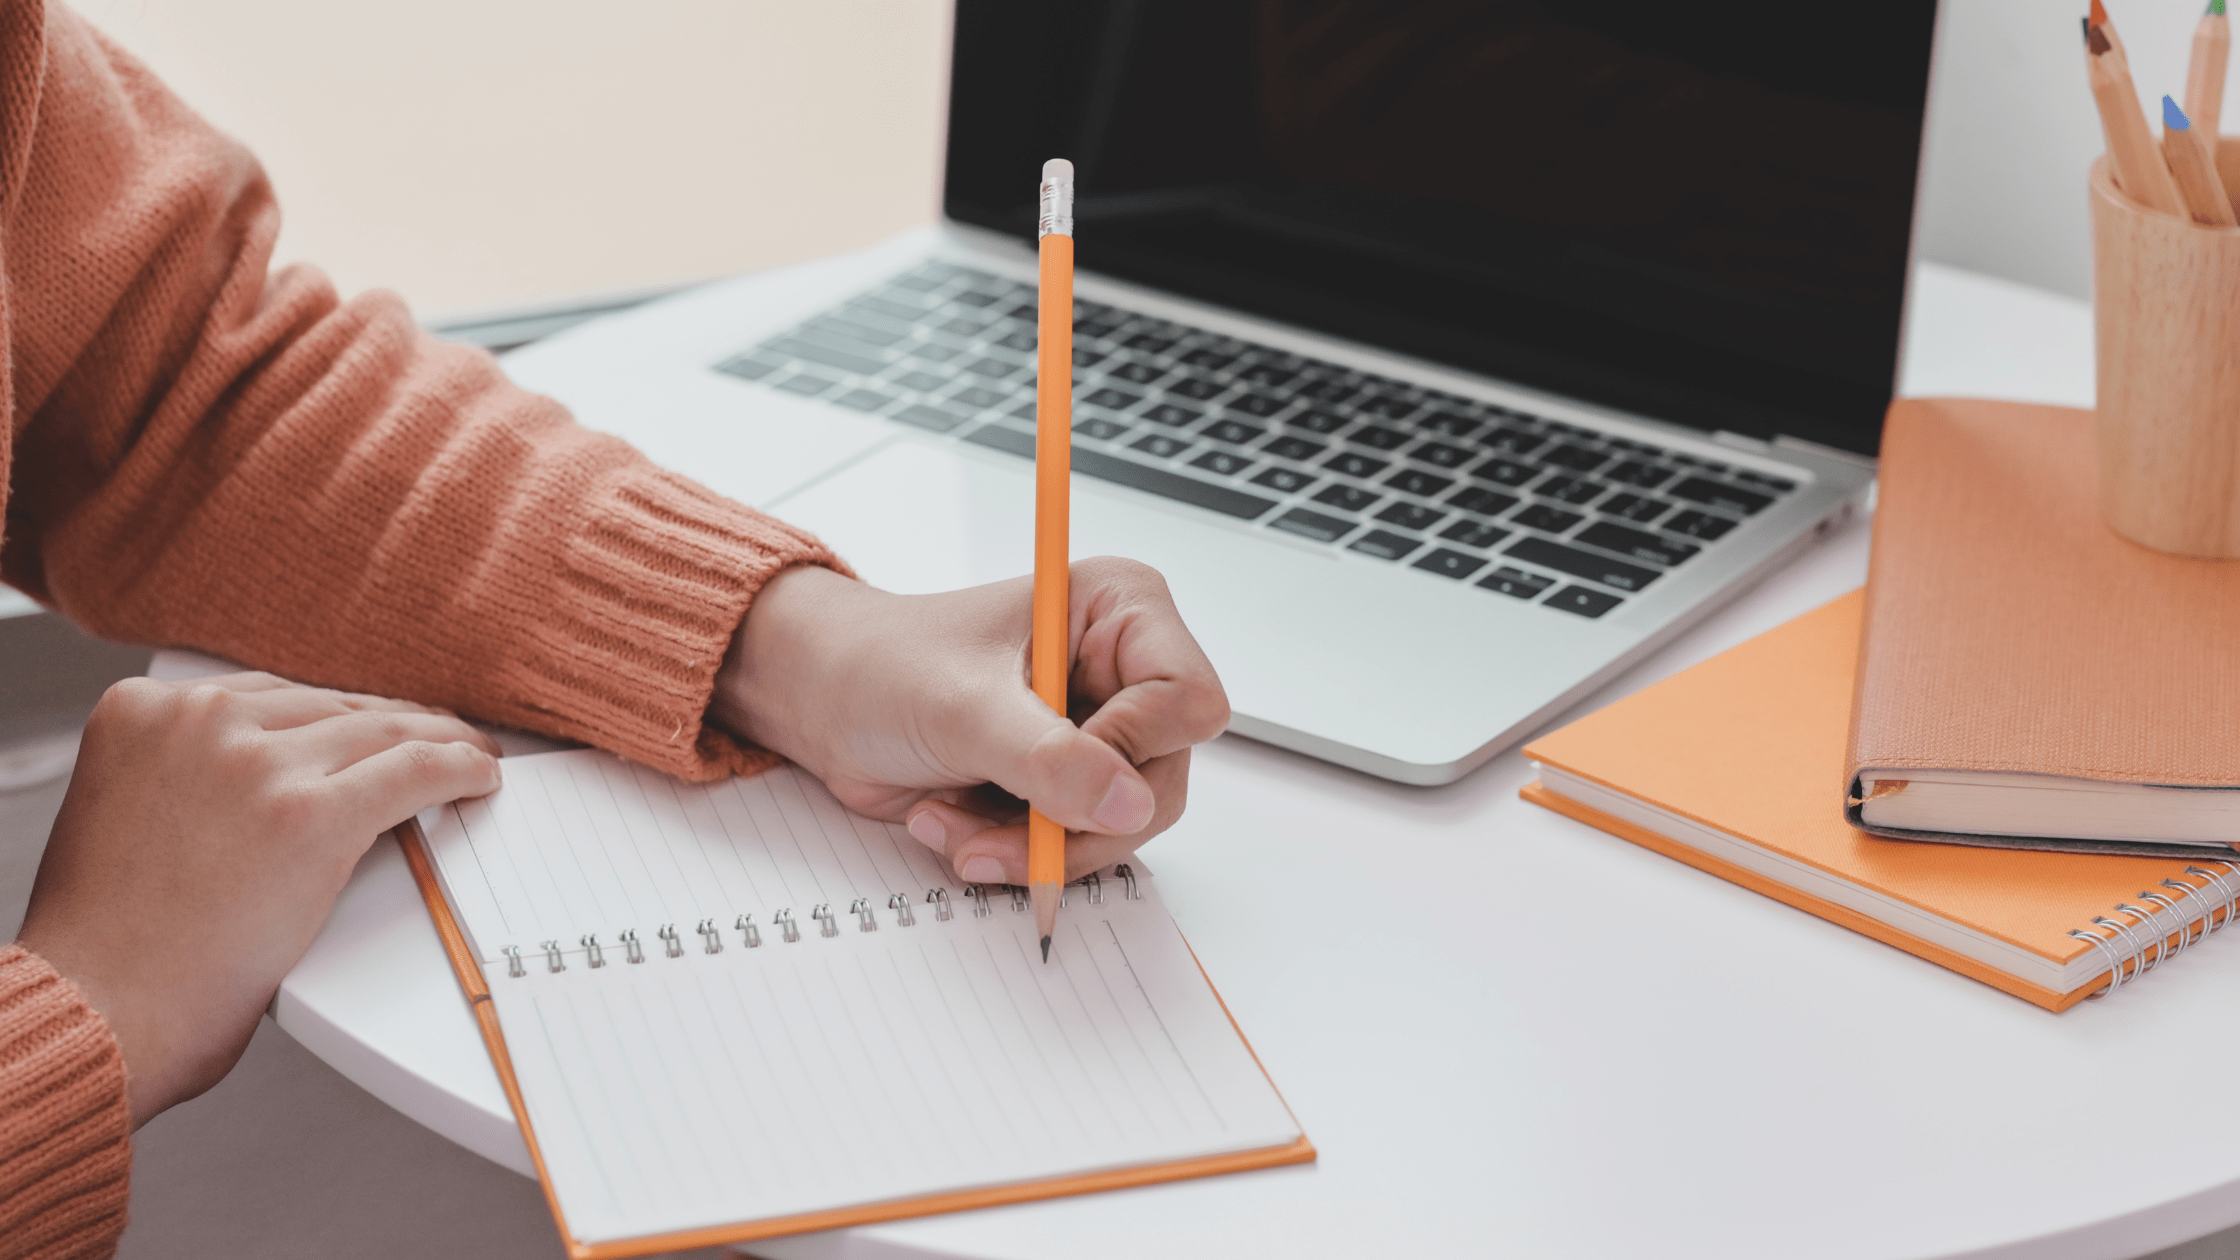 How to create an eye-catching CV